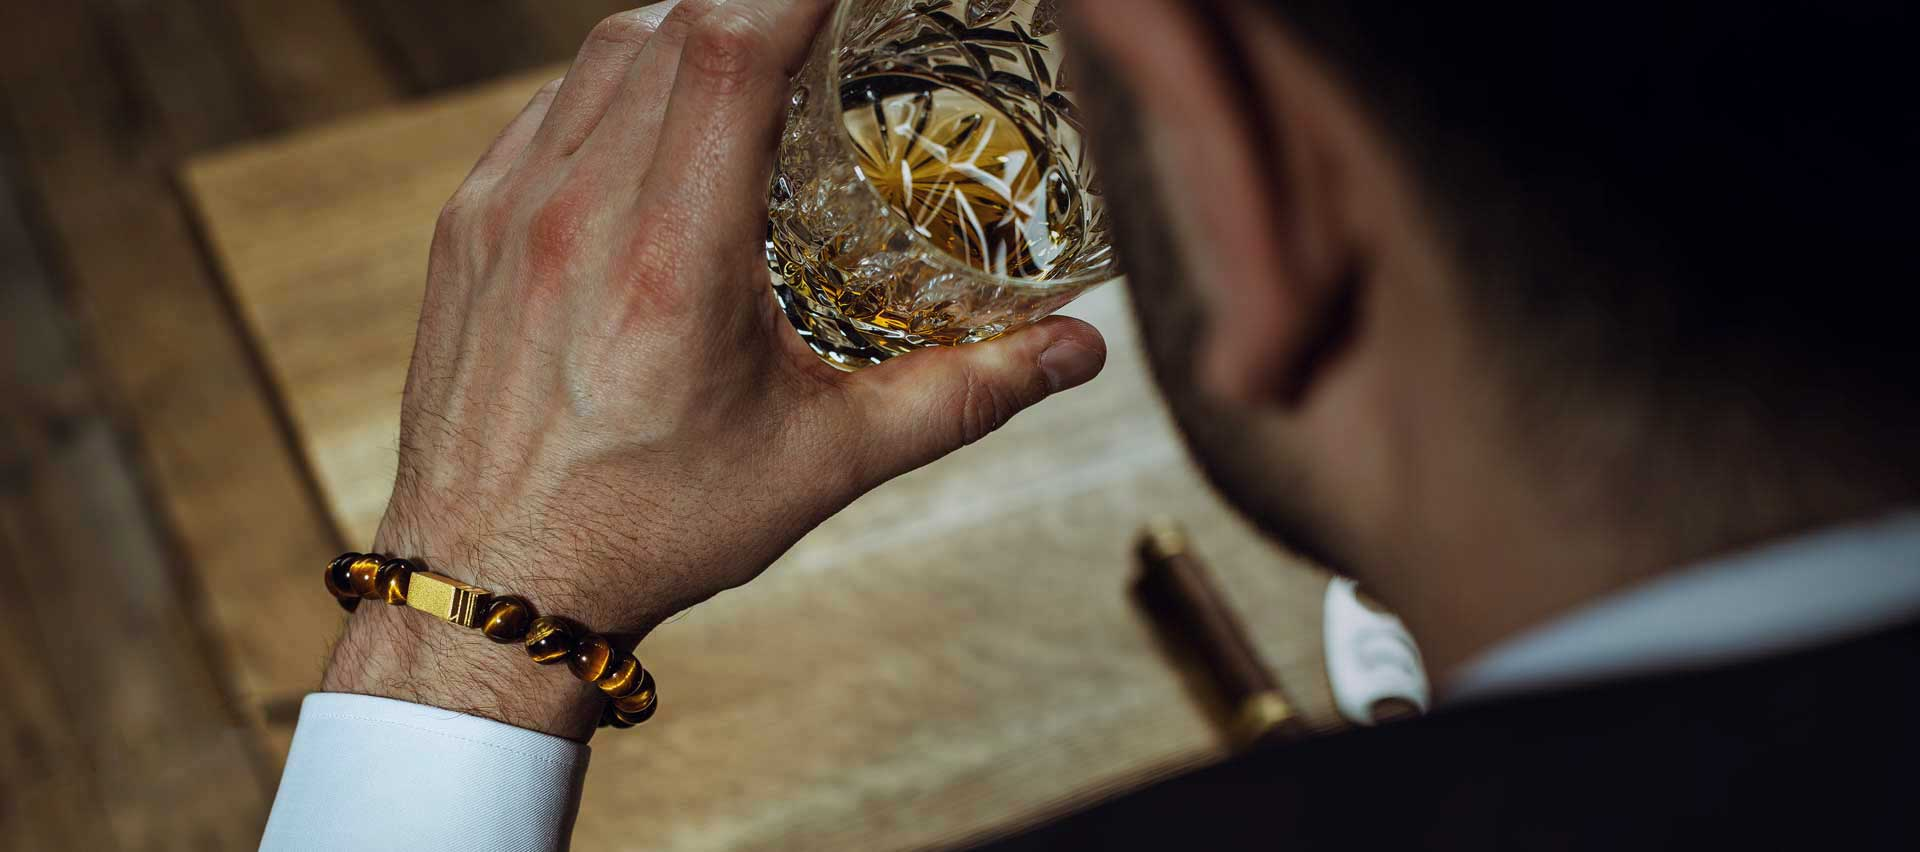 ONROXX premium bracelets